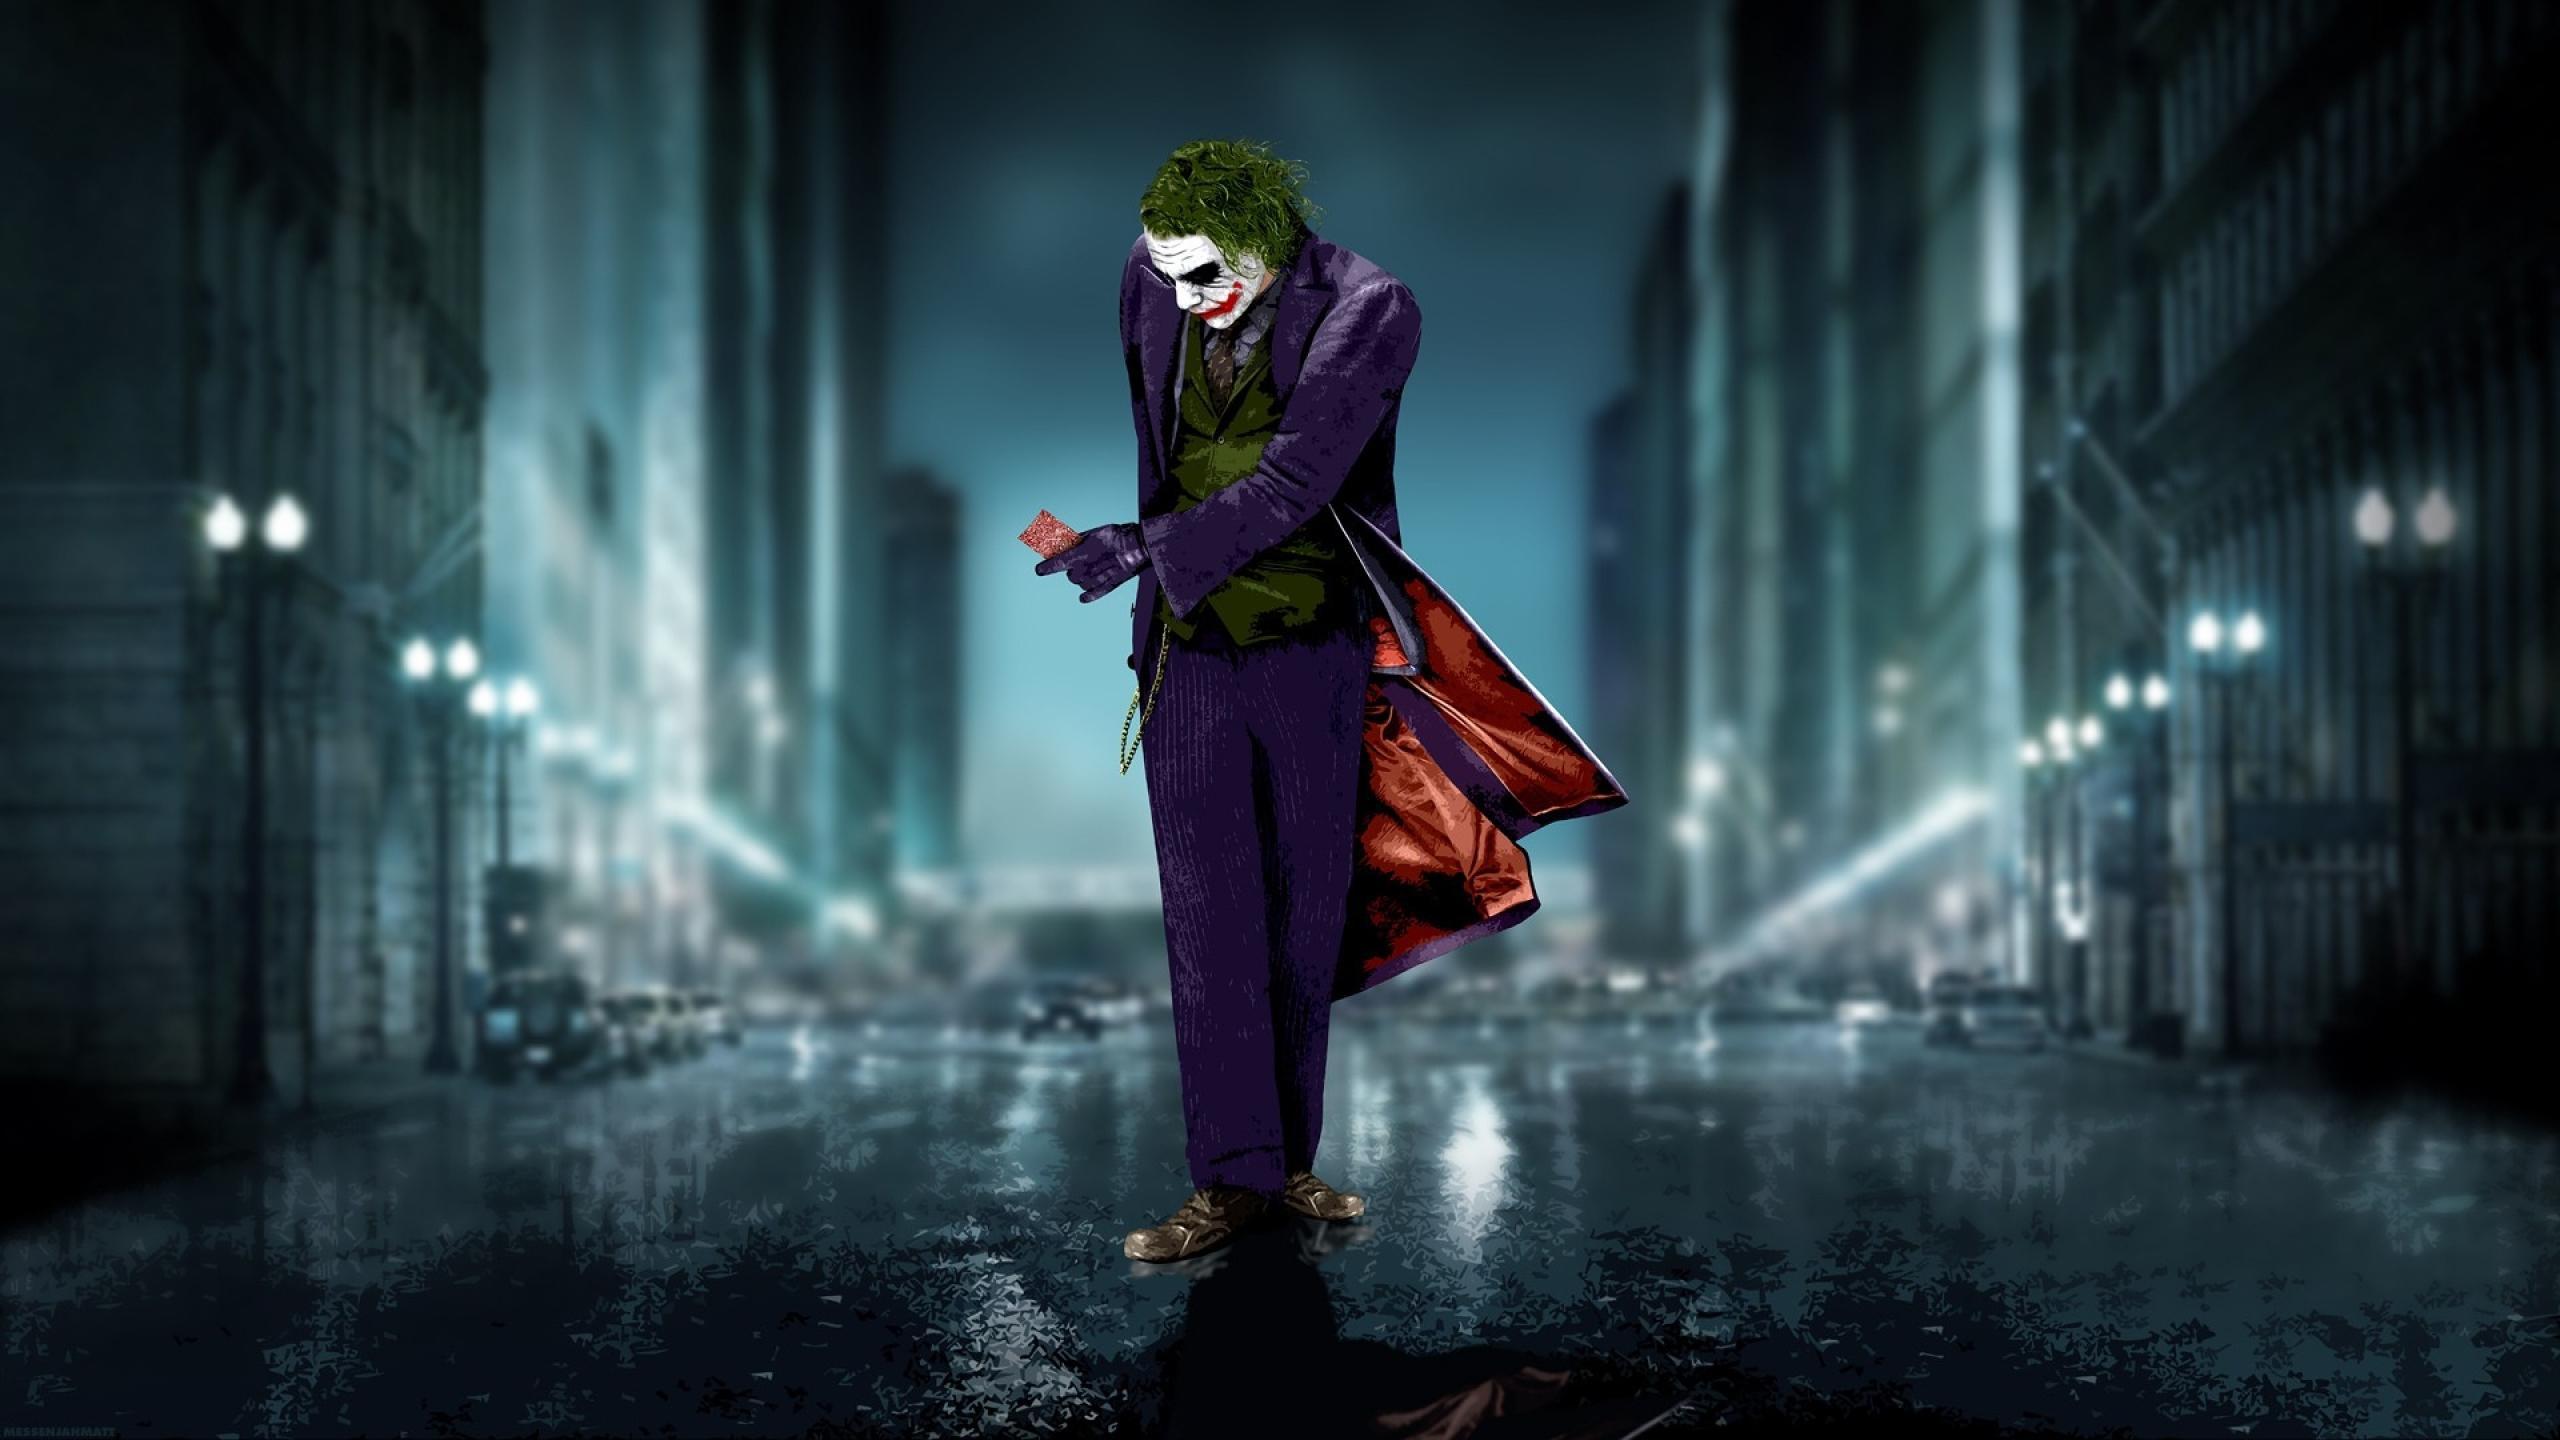 Free Download Joker Heath Ledger The Dark Wallpaper Other Wallpaper 2560x1440 For Your Desktop Mobile Tablet Explore 74 Heath Ledger Joker Wallpaper Joker Hd Wallpaper Joker Comic Wallpaper Heath